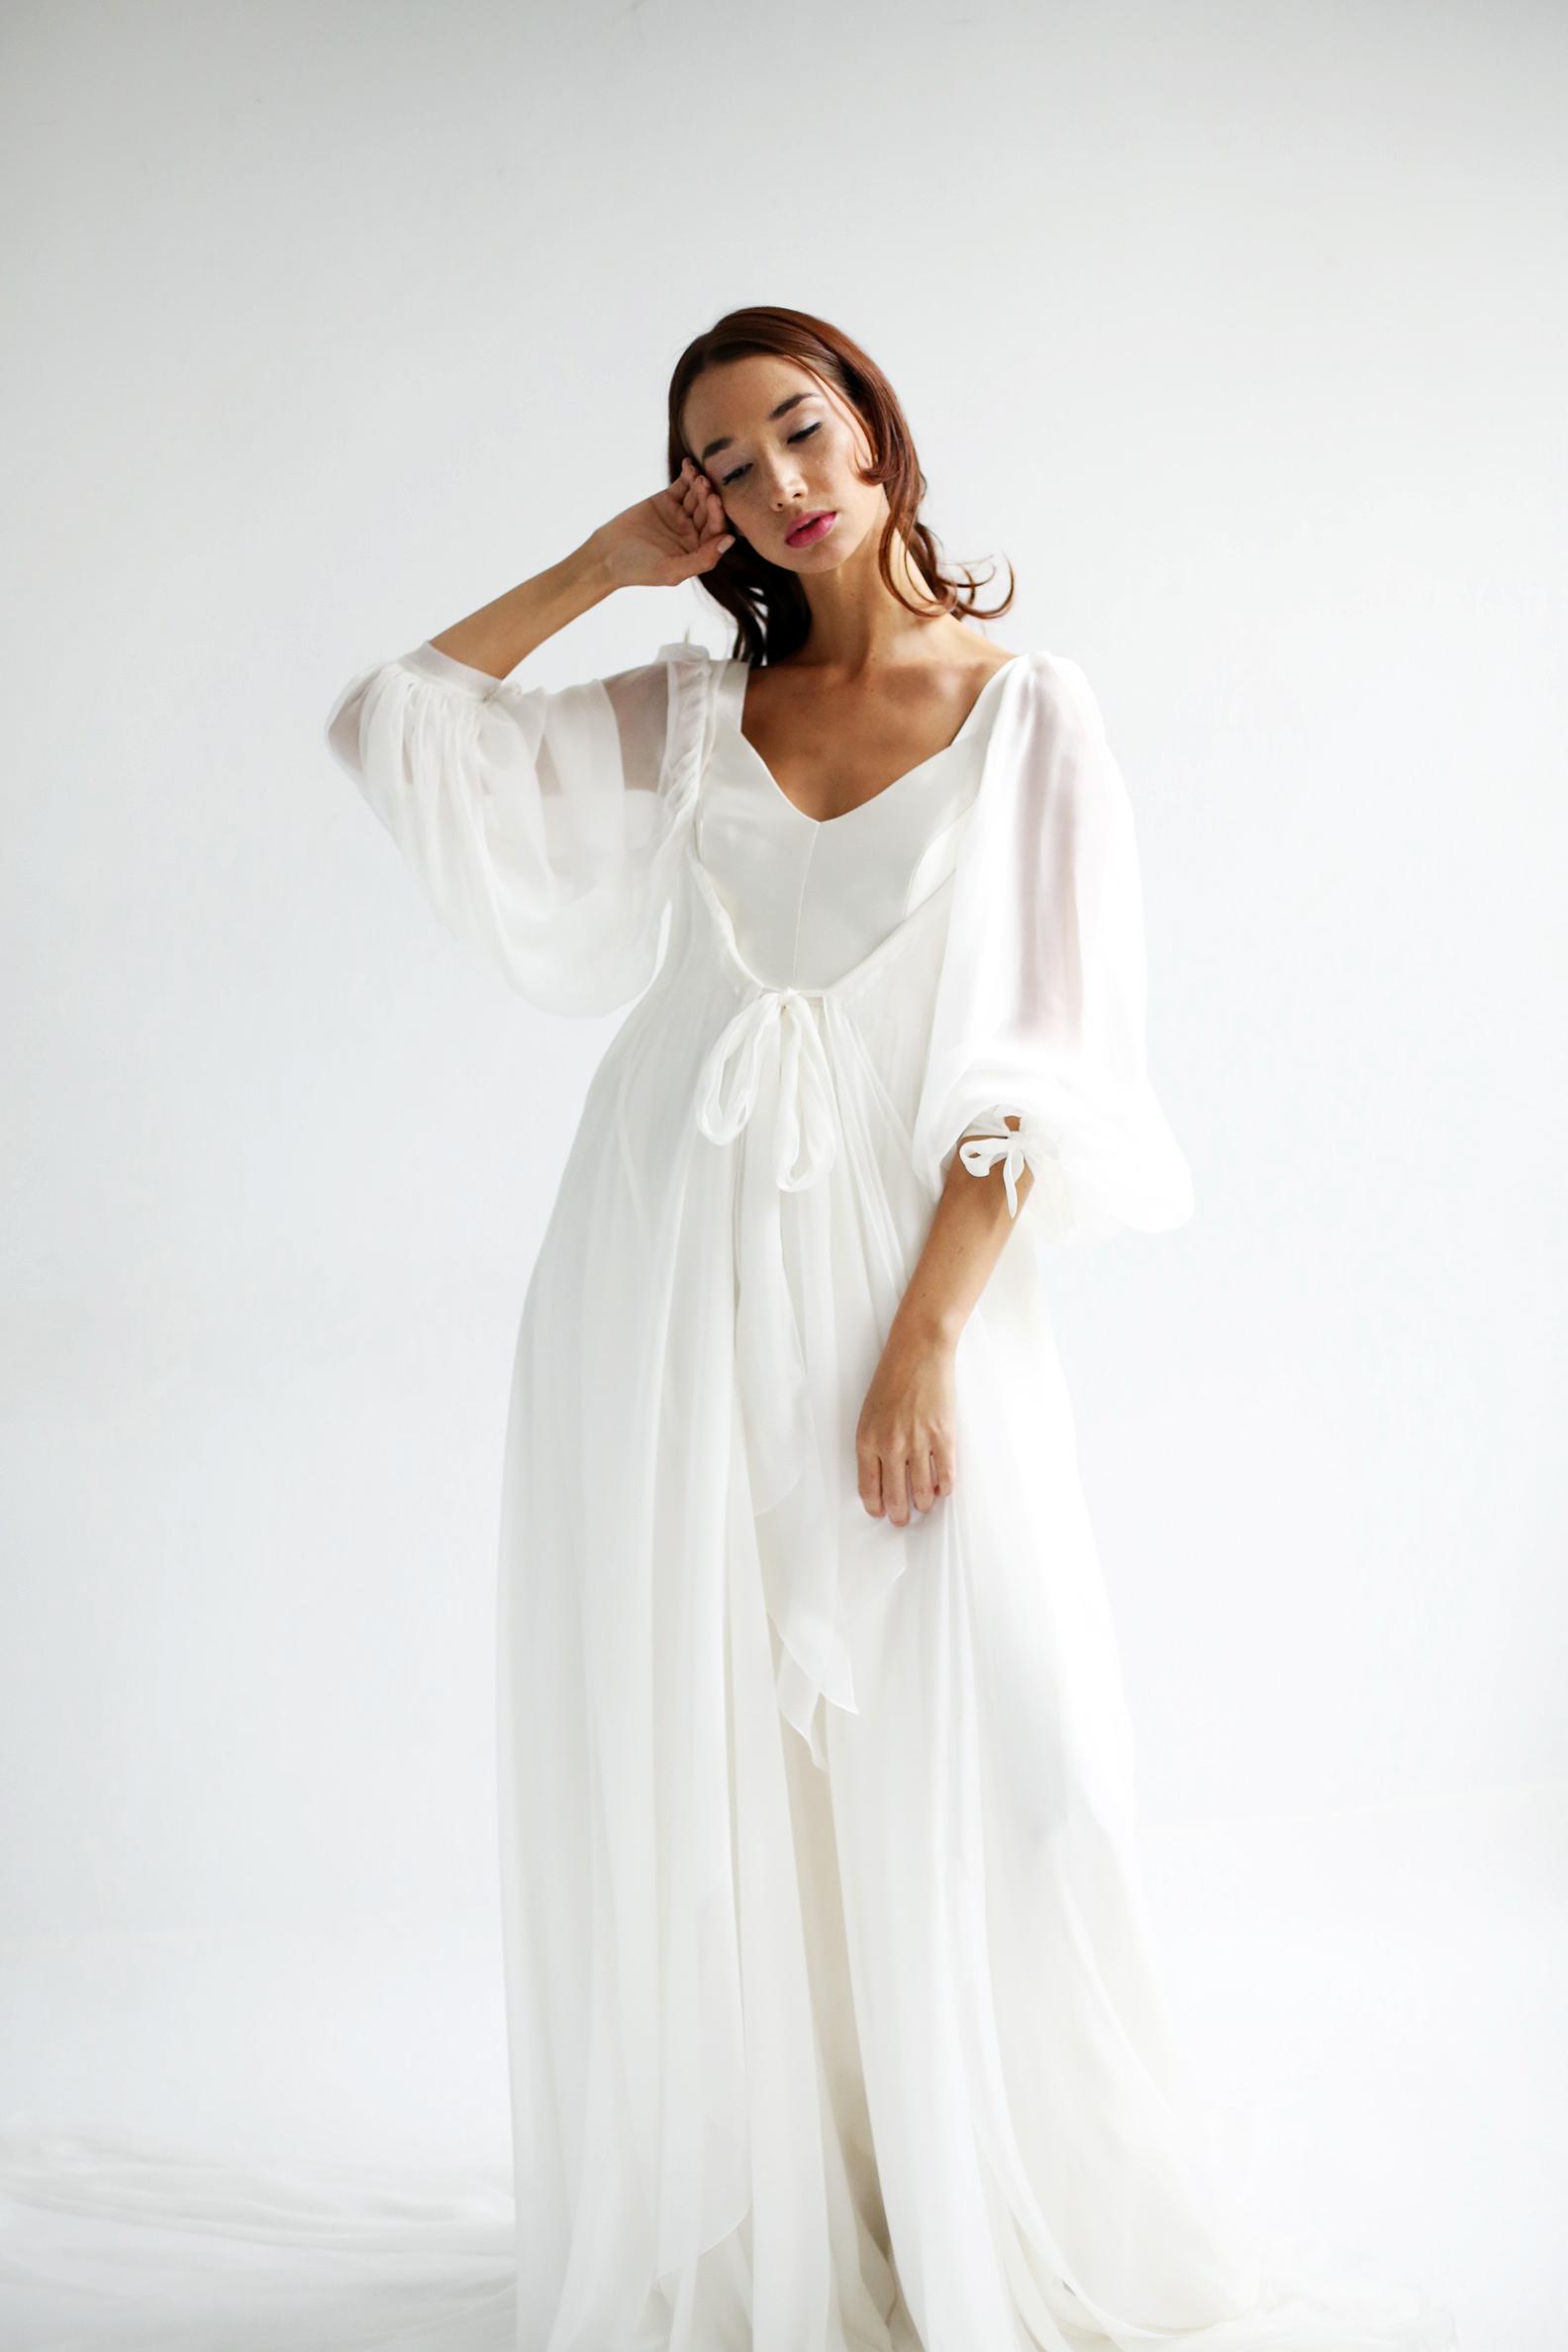 leanne marshall wedding dress spring 2019 bell sleeves bows